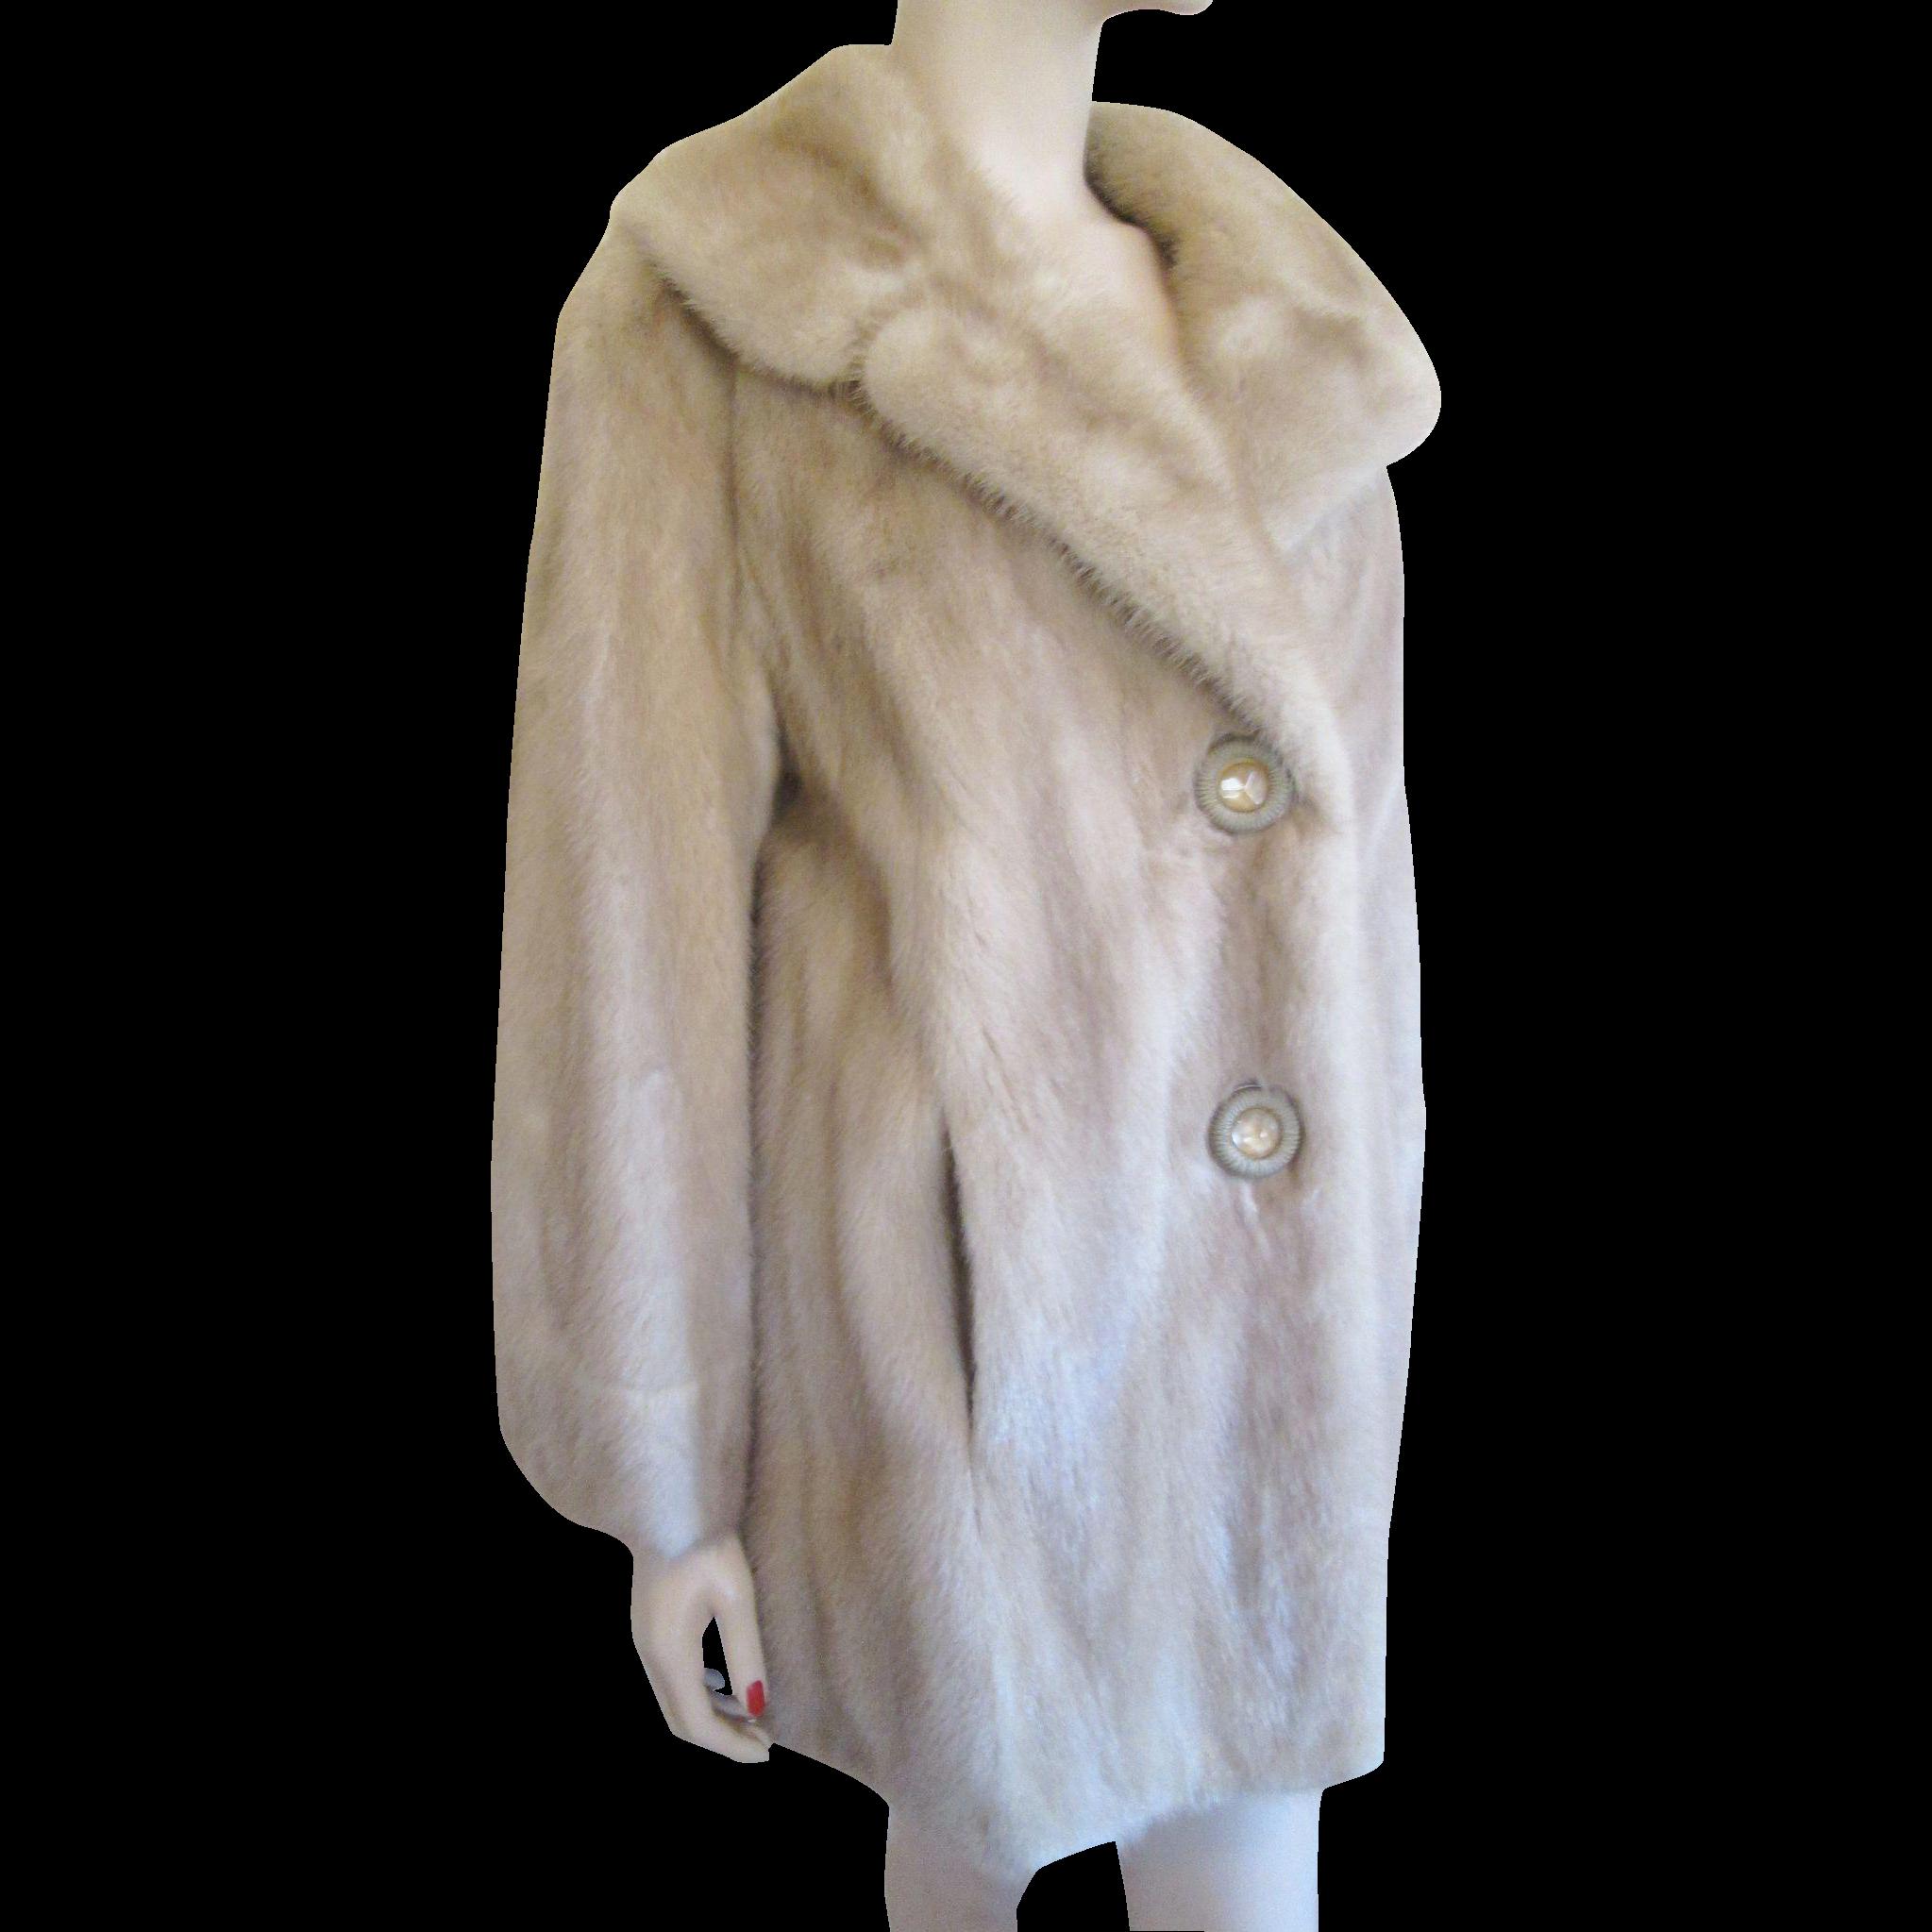 White Fur Coat PNG Image